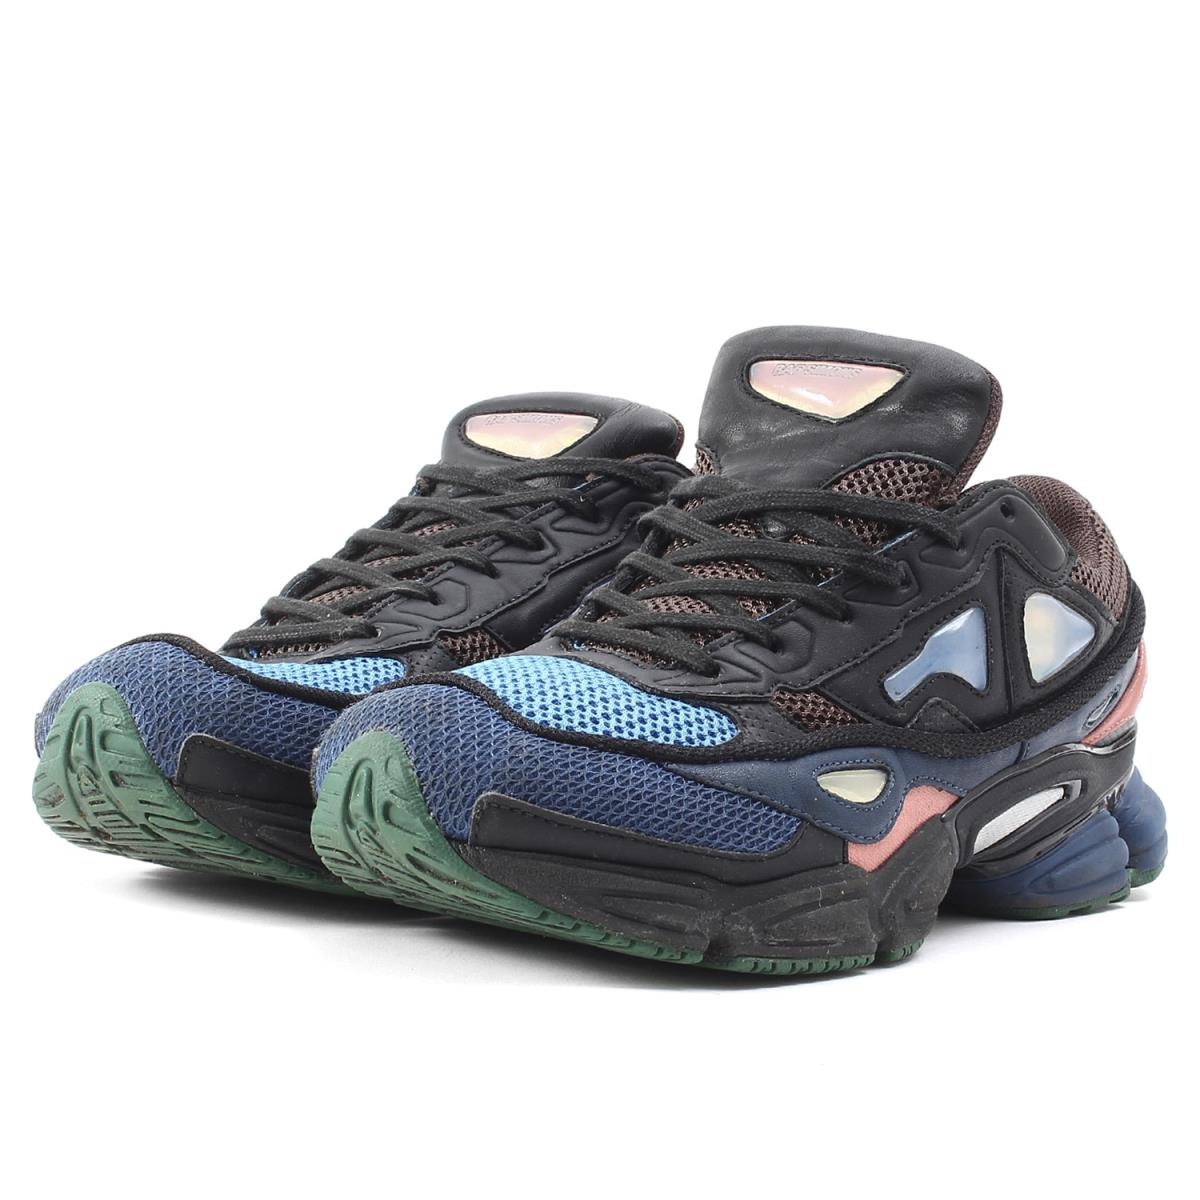 la moitié 66aa3 ef9d8 RAF SIMONS (rough Simmons) X adidas OZWEEGO II(S76451) オズウィーゴ 2 sneakers  black US8.5(26.5cm)